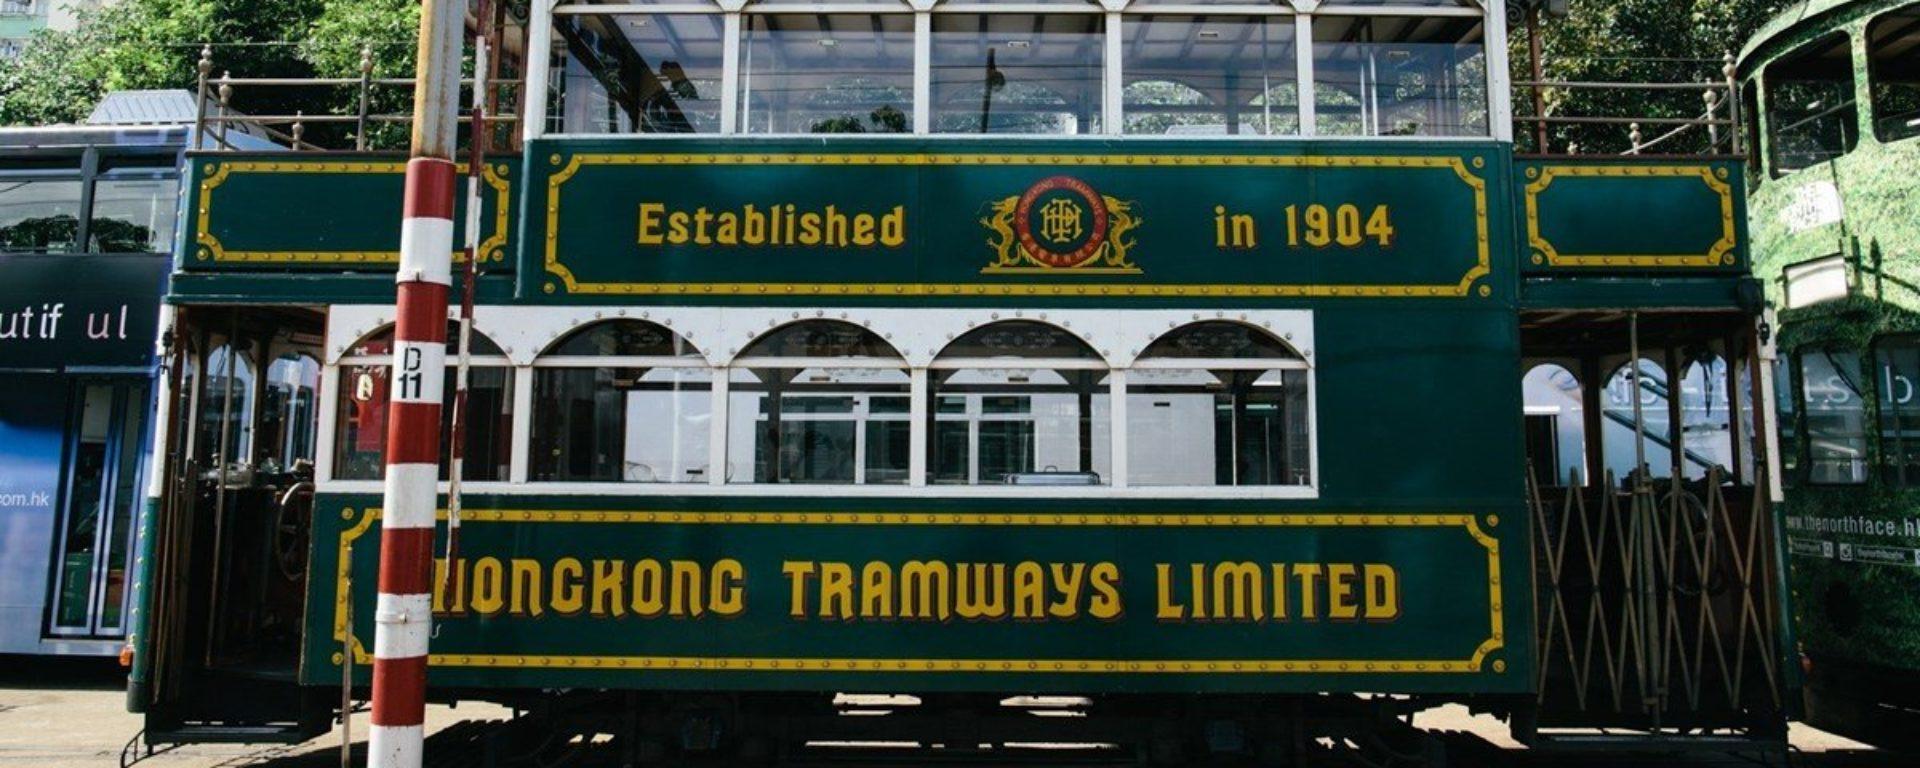 Transdev-hk-tram-covid19